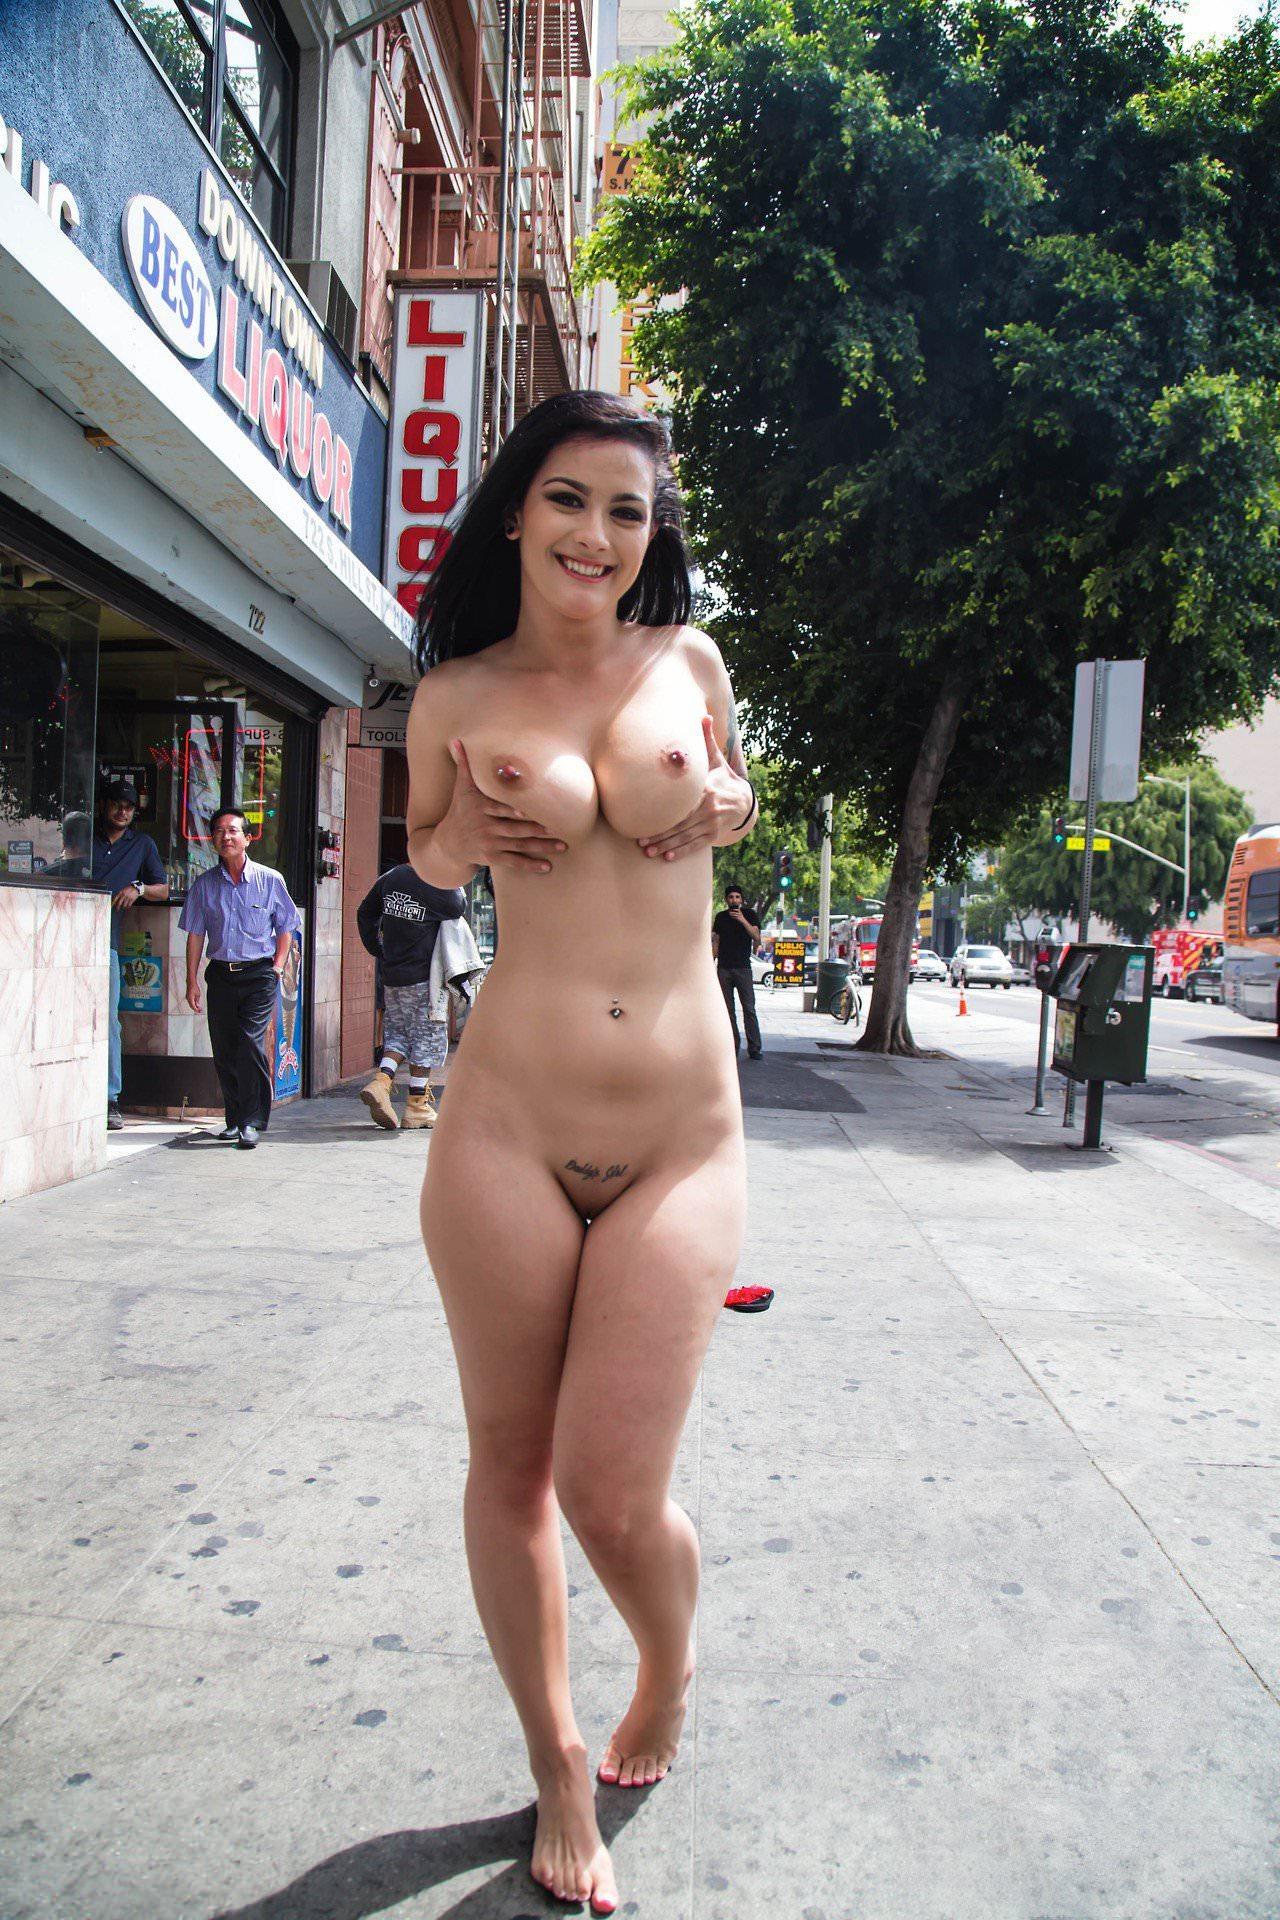 Voluptuous Slut Fucks Naked Outside In Her First Porn Appearance